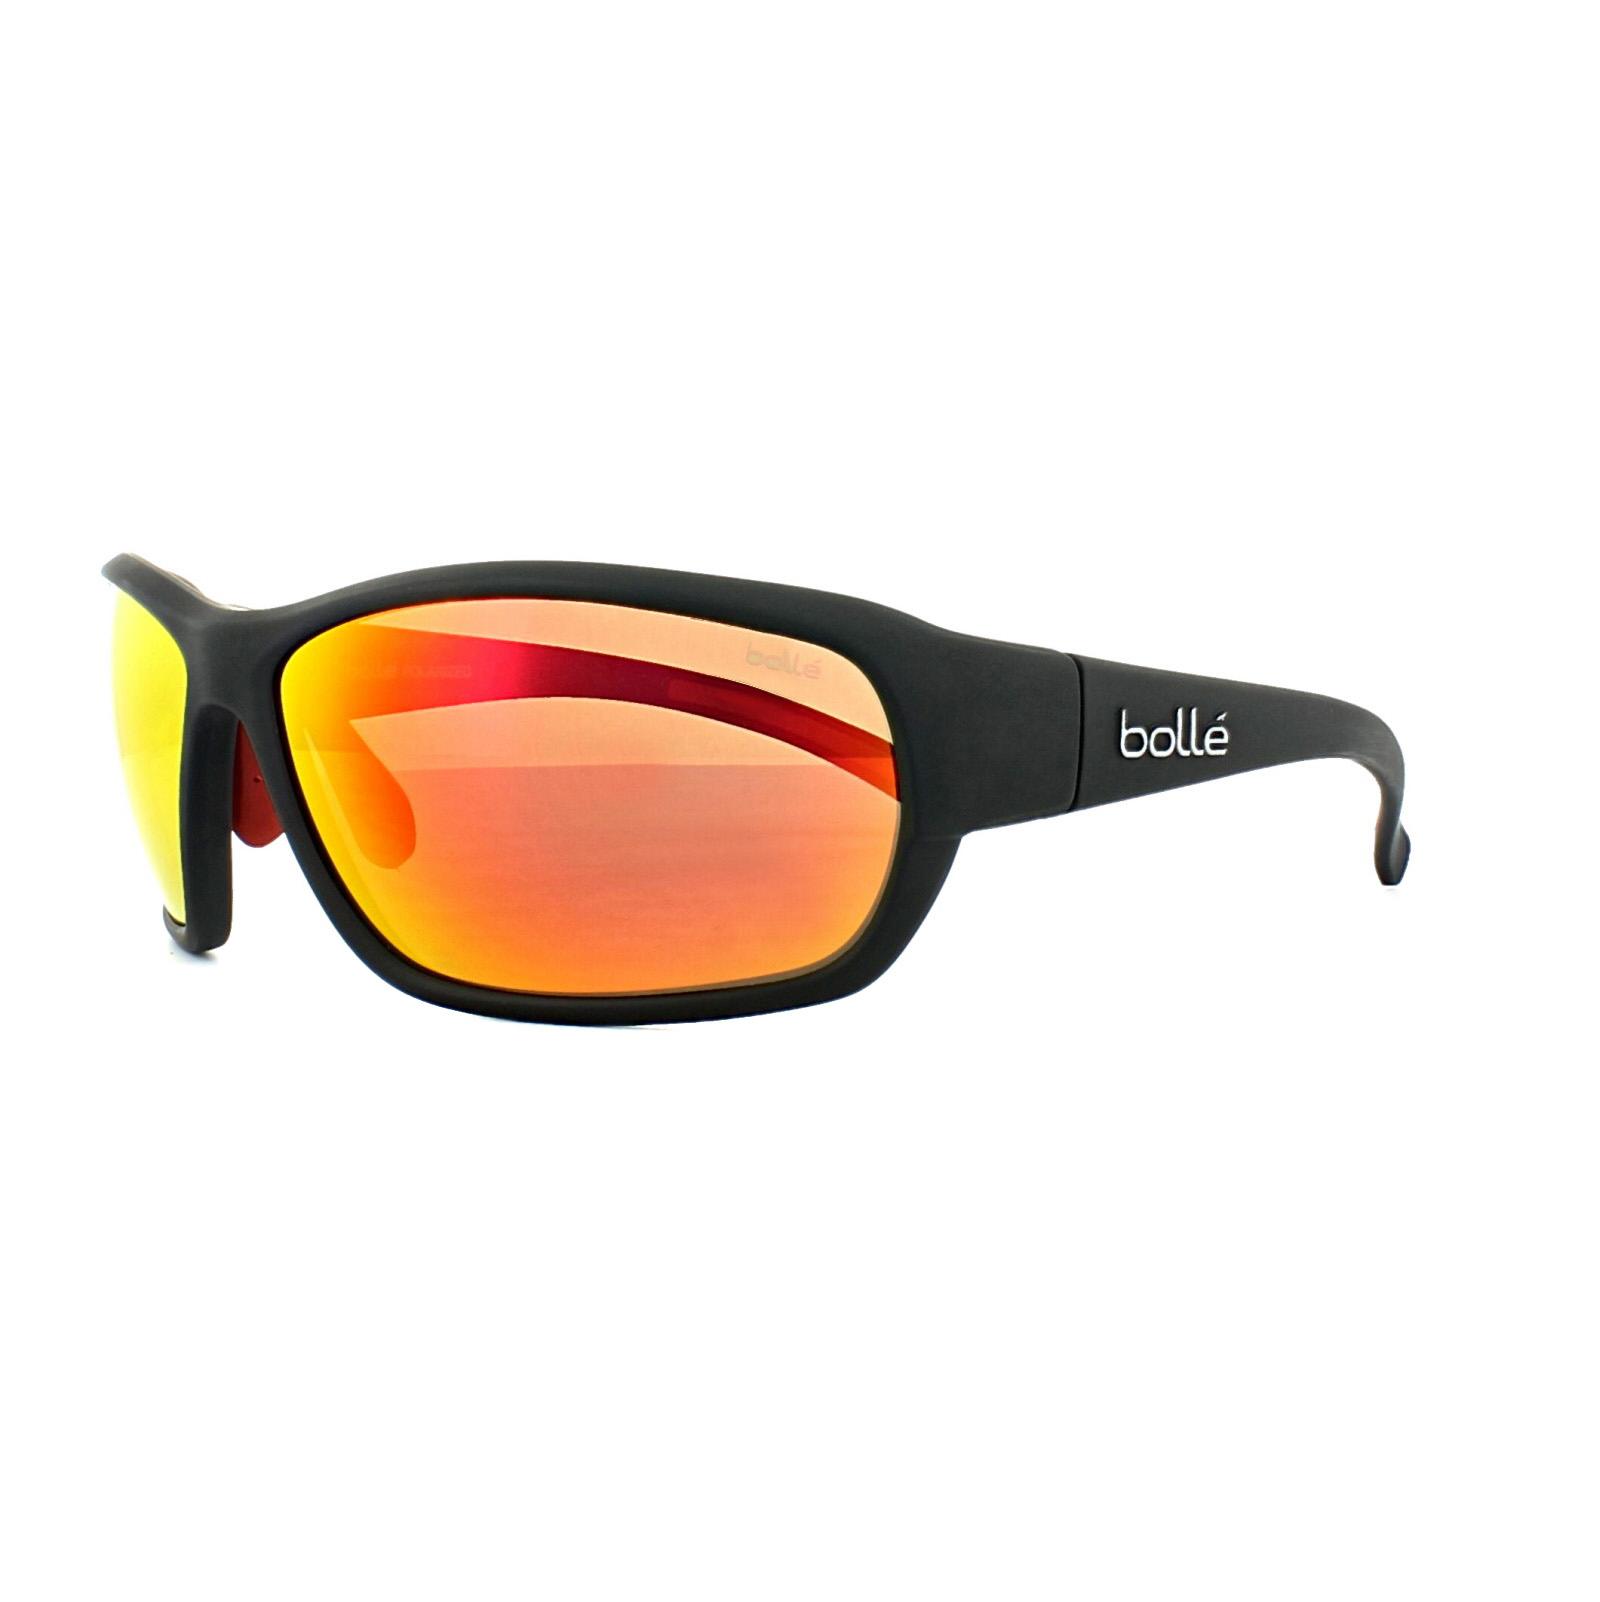 f26d8339baede Details about Bolle Sunglasses Bounty 11679 Matt Black TNS Fire Red Mirror  Polarized